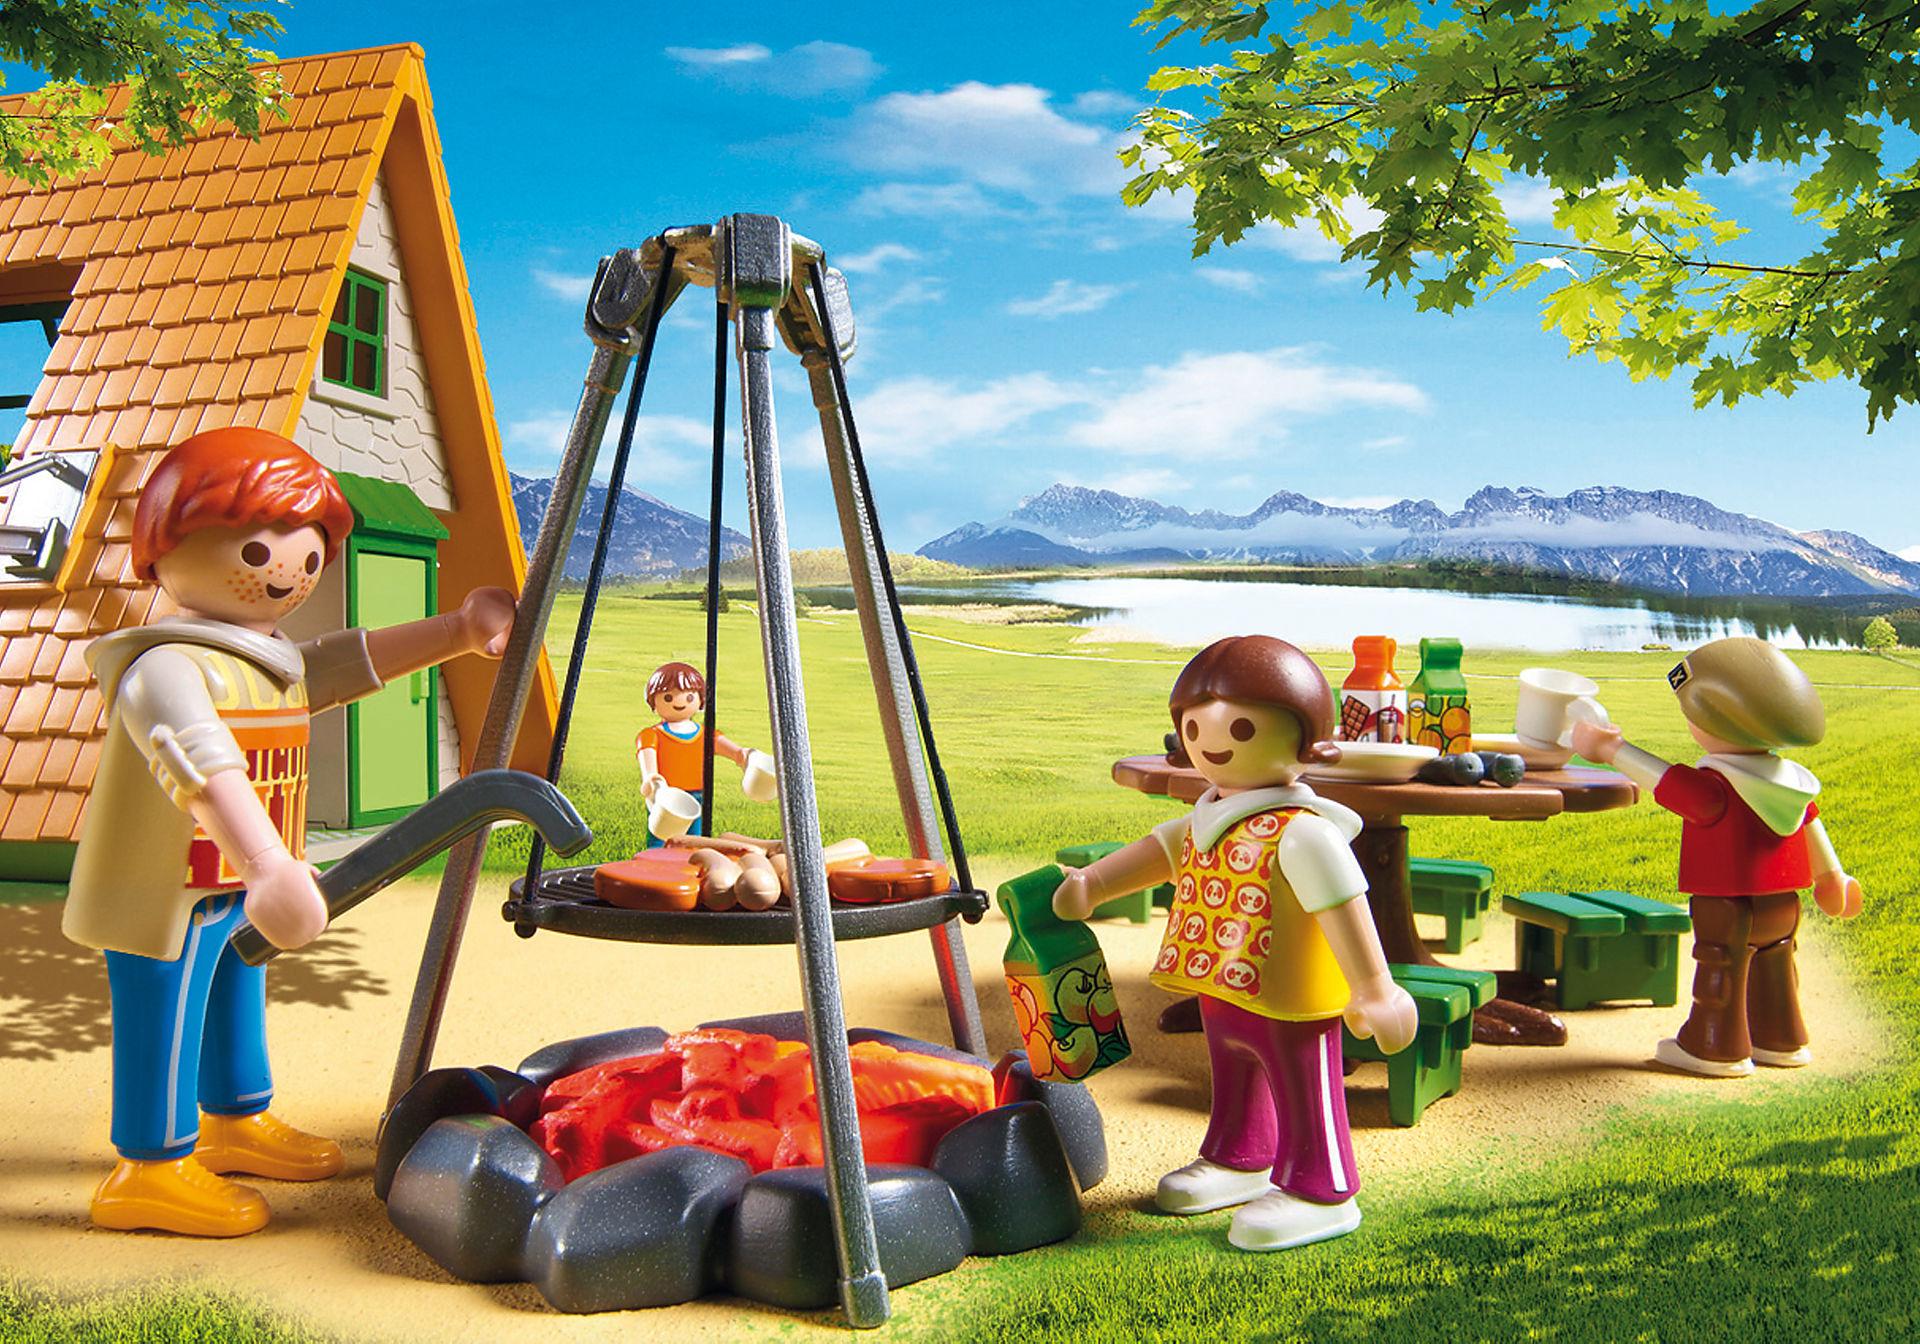 http://media.playmobil.com/i/playmobil/6887_product_extra4/Grote vakantiebungalow